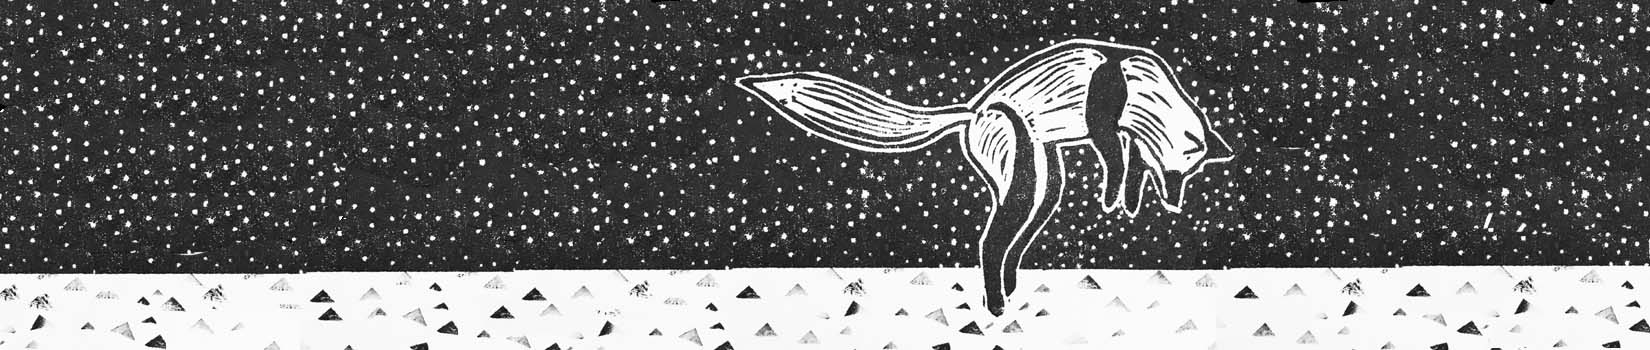 Daniela Fox Illustrations